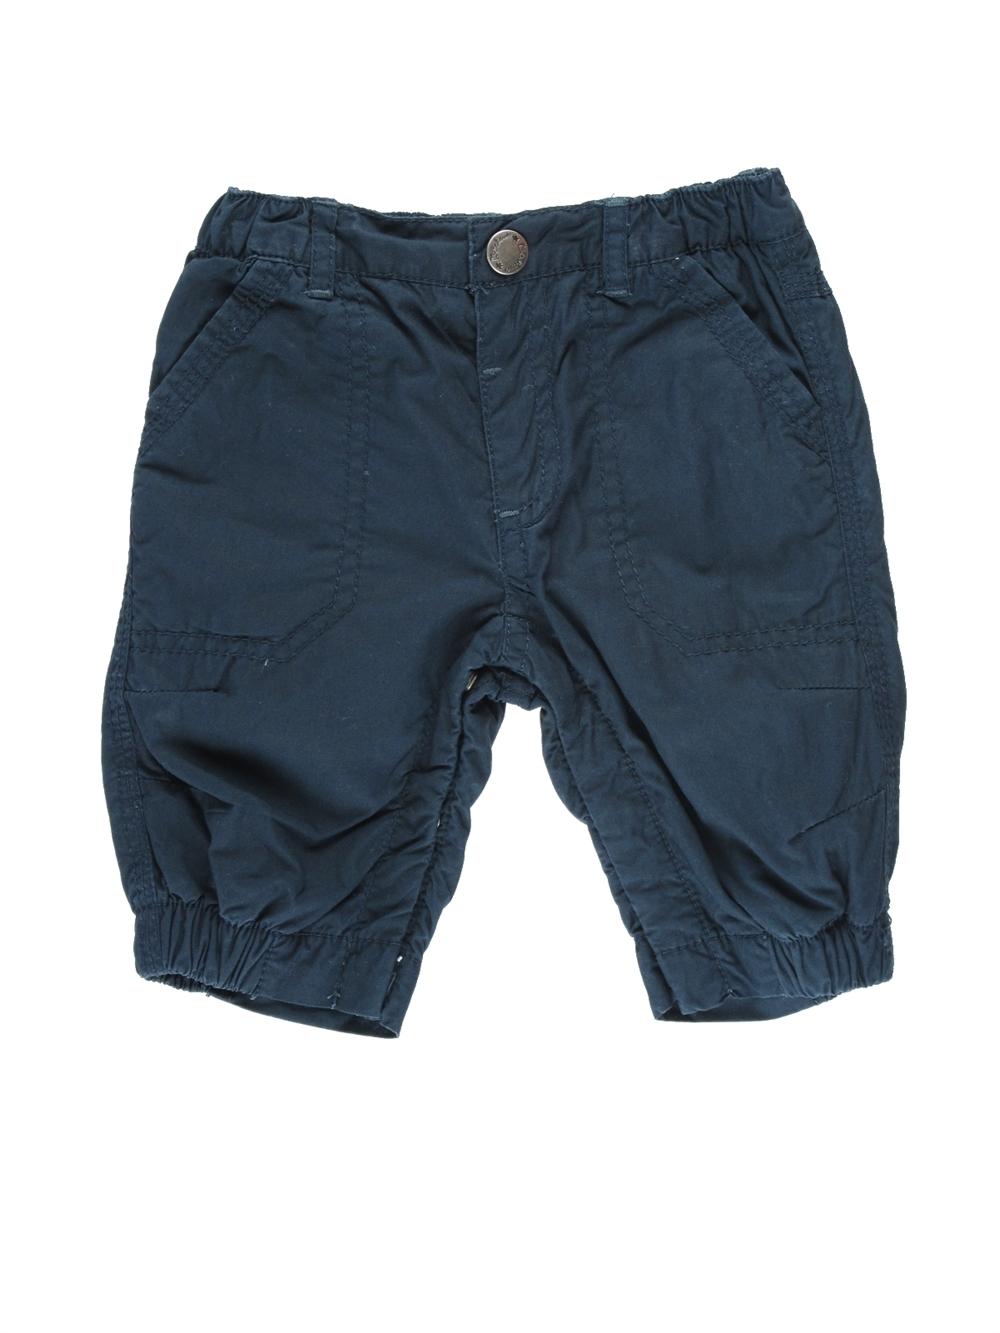 pantalon garcon kiabi 1 mois pas cher. Black Bedroom Furniture Sets. Home Design Ideas